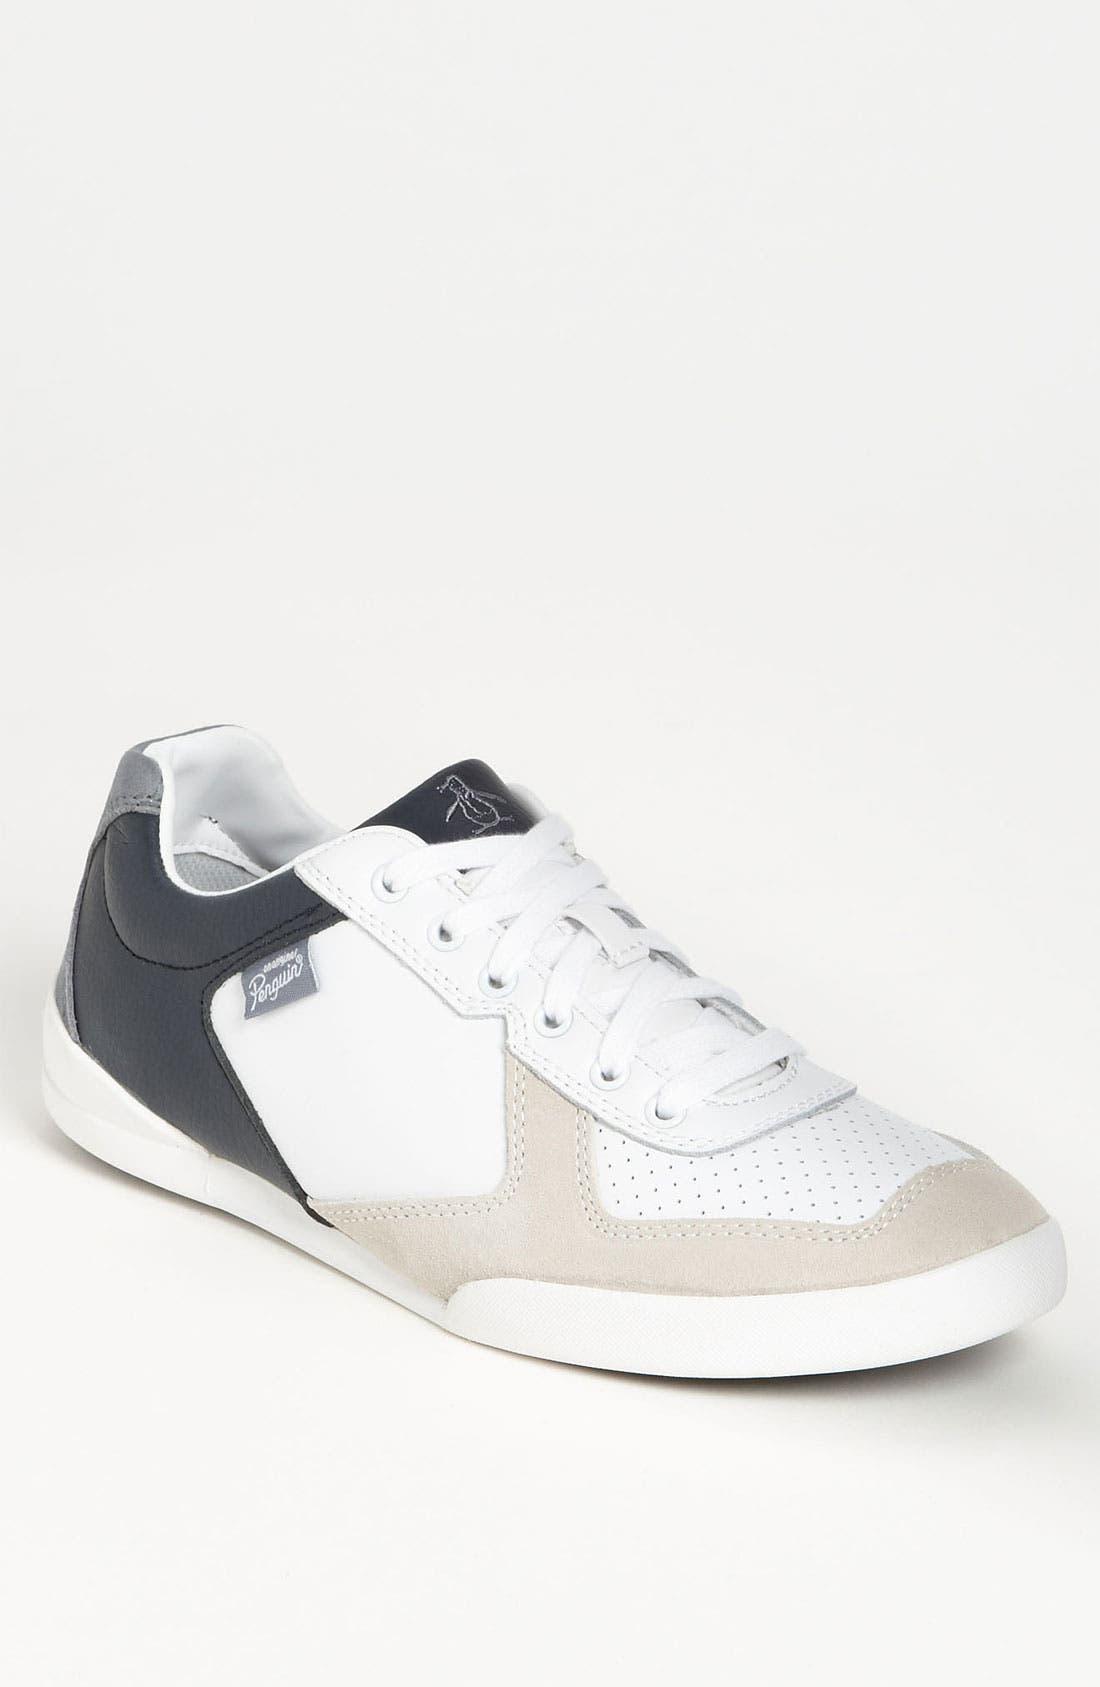 Alternate Image 1 Selected - Original Penguin 'Fandango' Sneaker